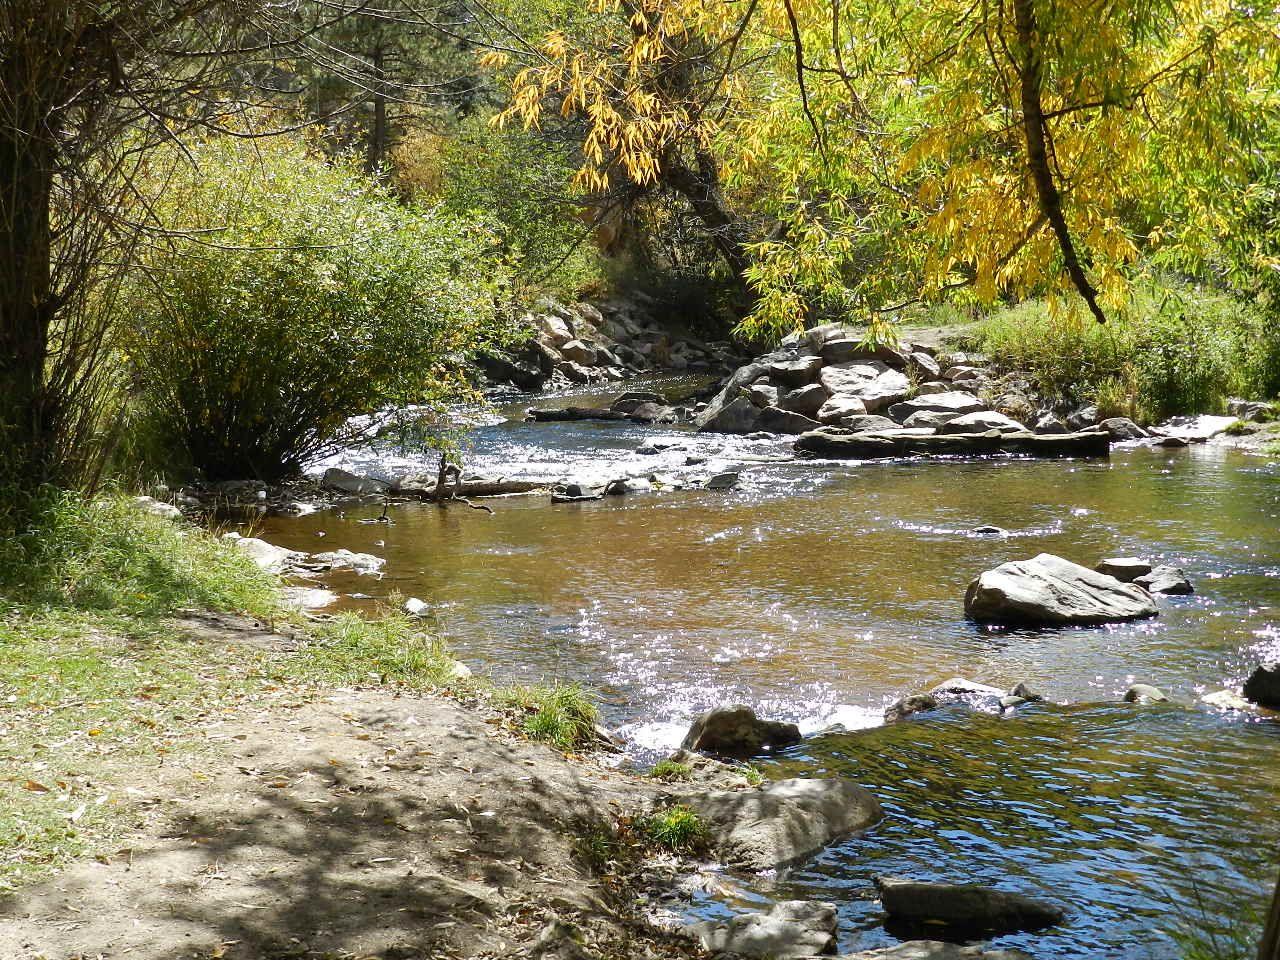 stream beside our picnic spot in O'Fallon Park, CO  9/26/11